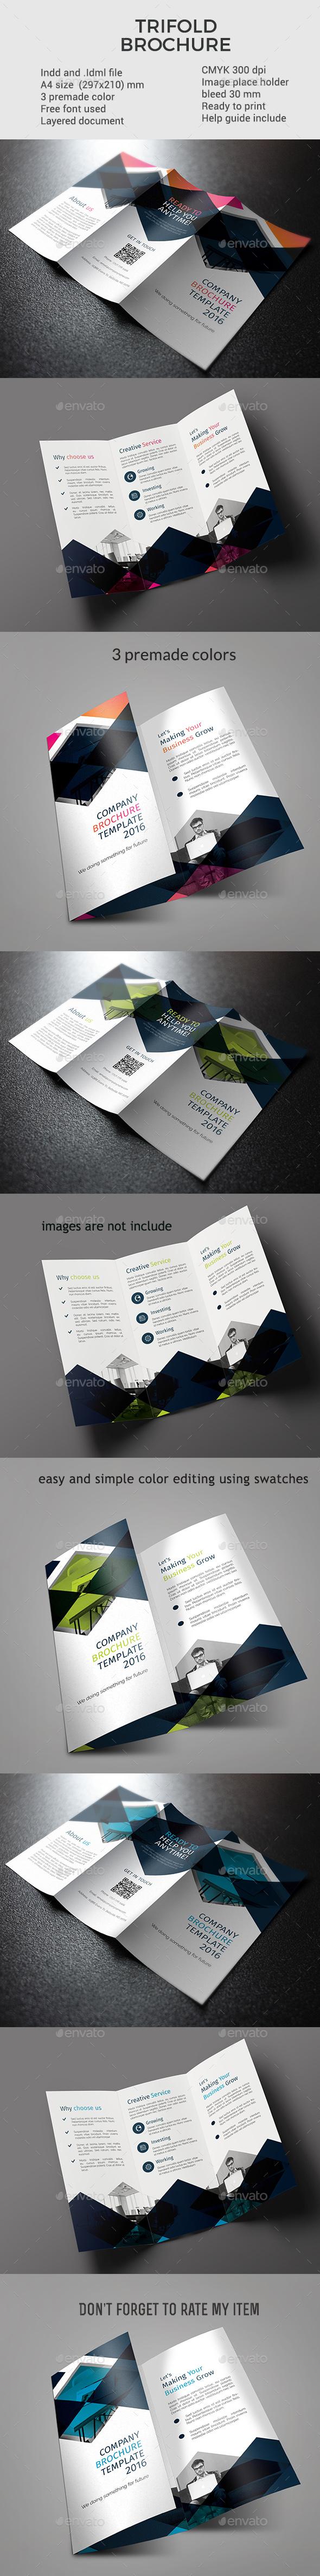 Modern trifold brochures Design Template vol 4 - Corporate Brochures Design Template InDesign INDD. Download here: https://graphicriver.net/item/modern-trifold-brochures-vol-4/17042633?s_rank=238&ref=yinkira